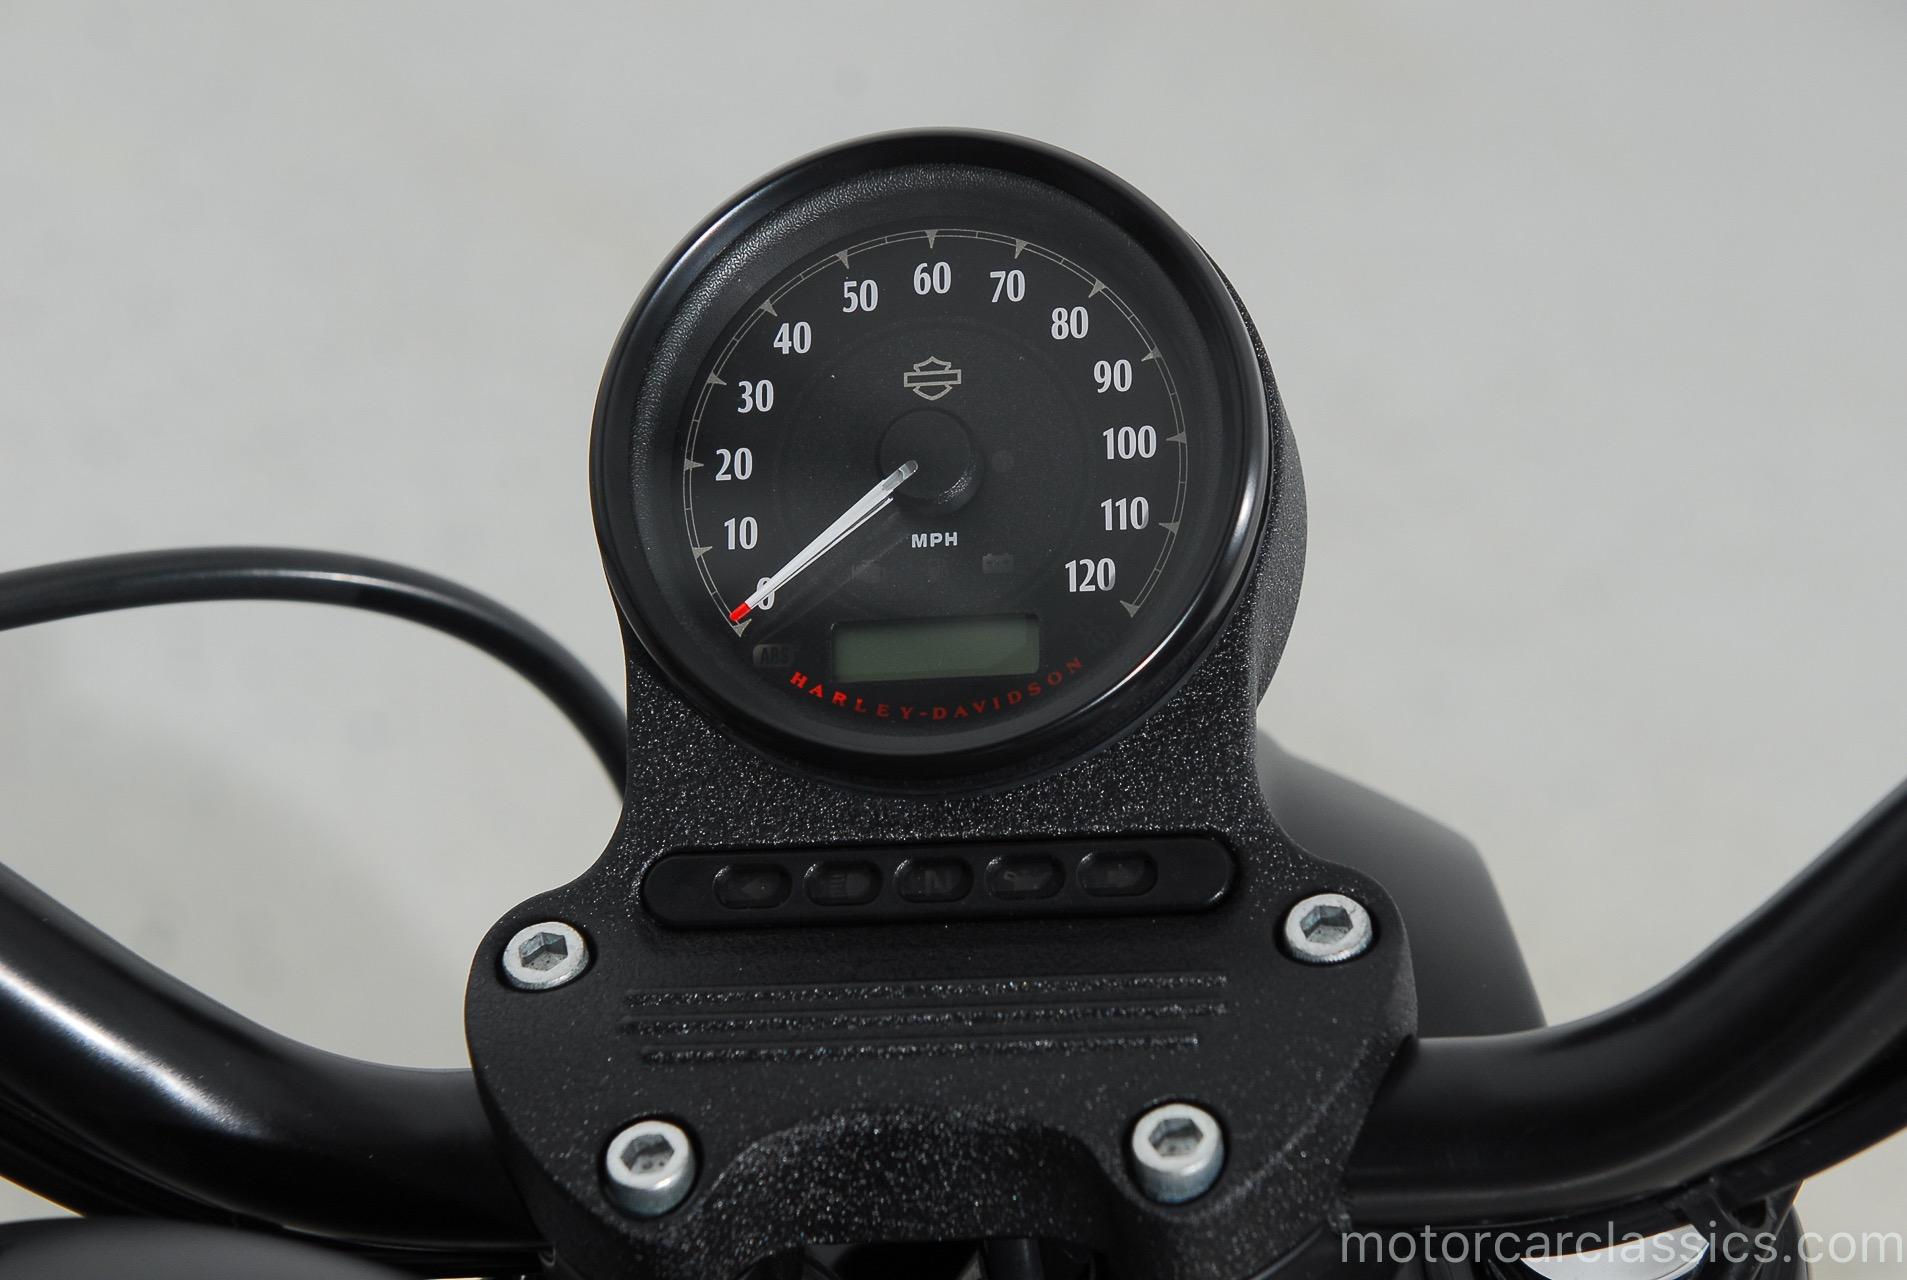 2017 Harley-Davidson XL883N